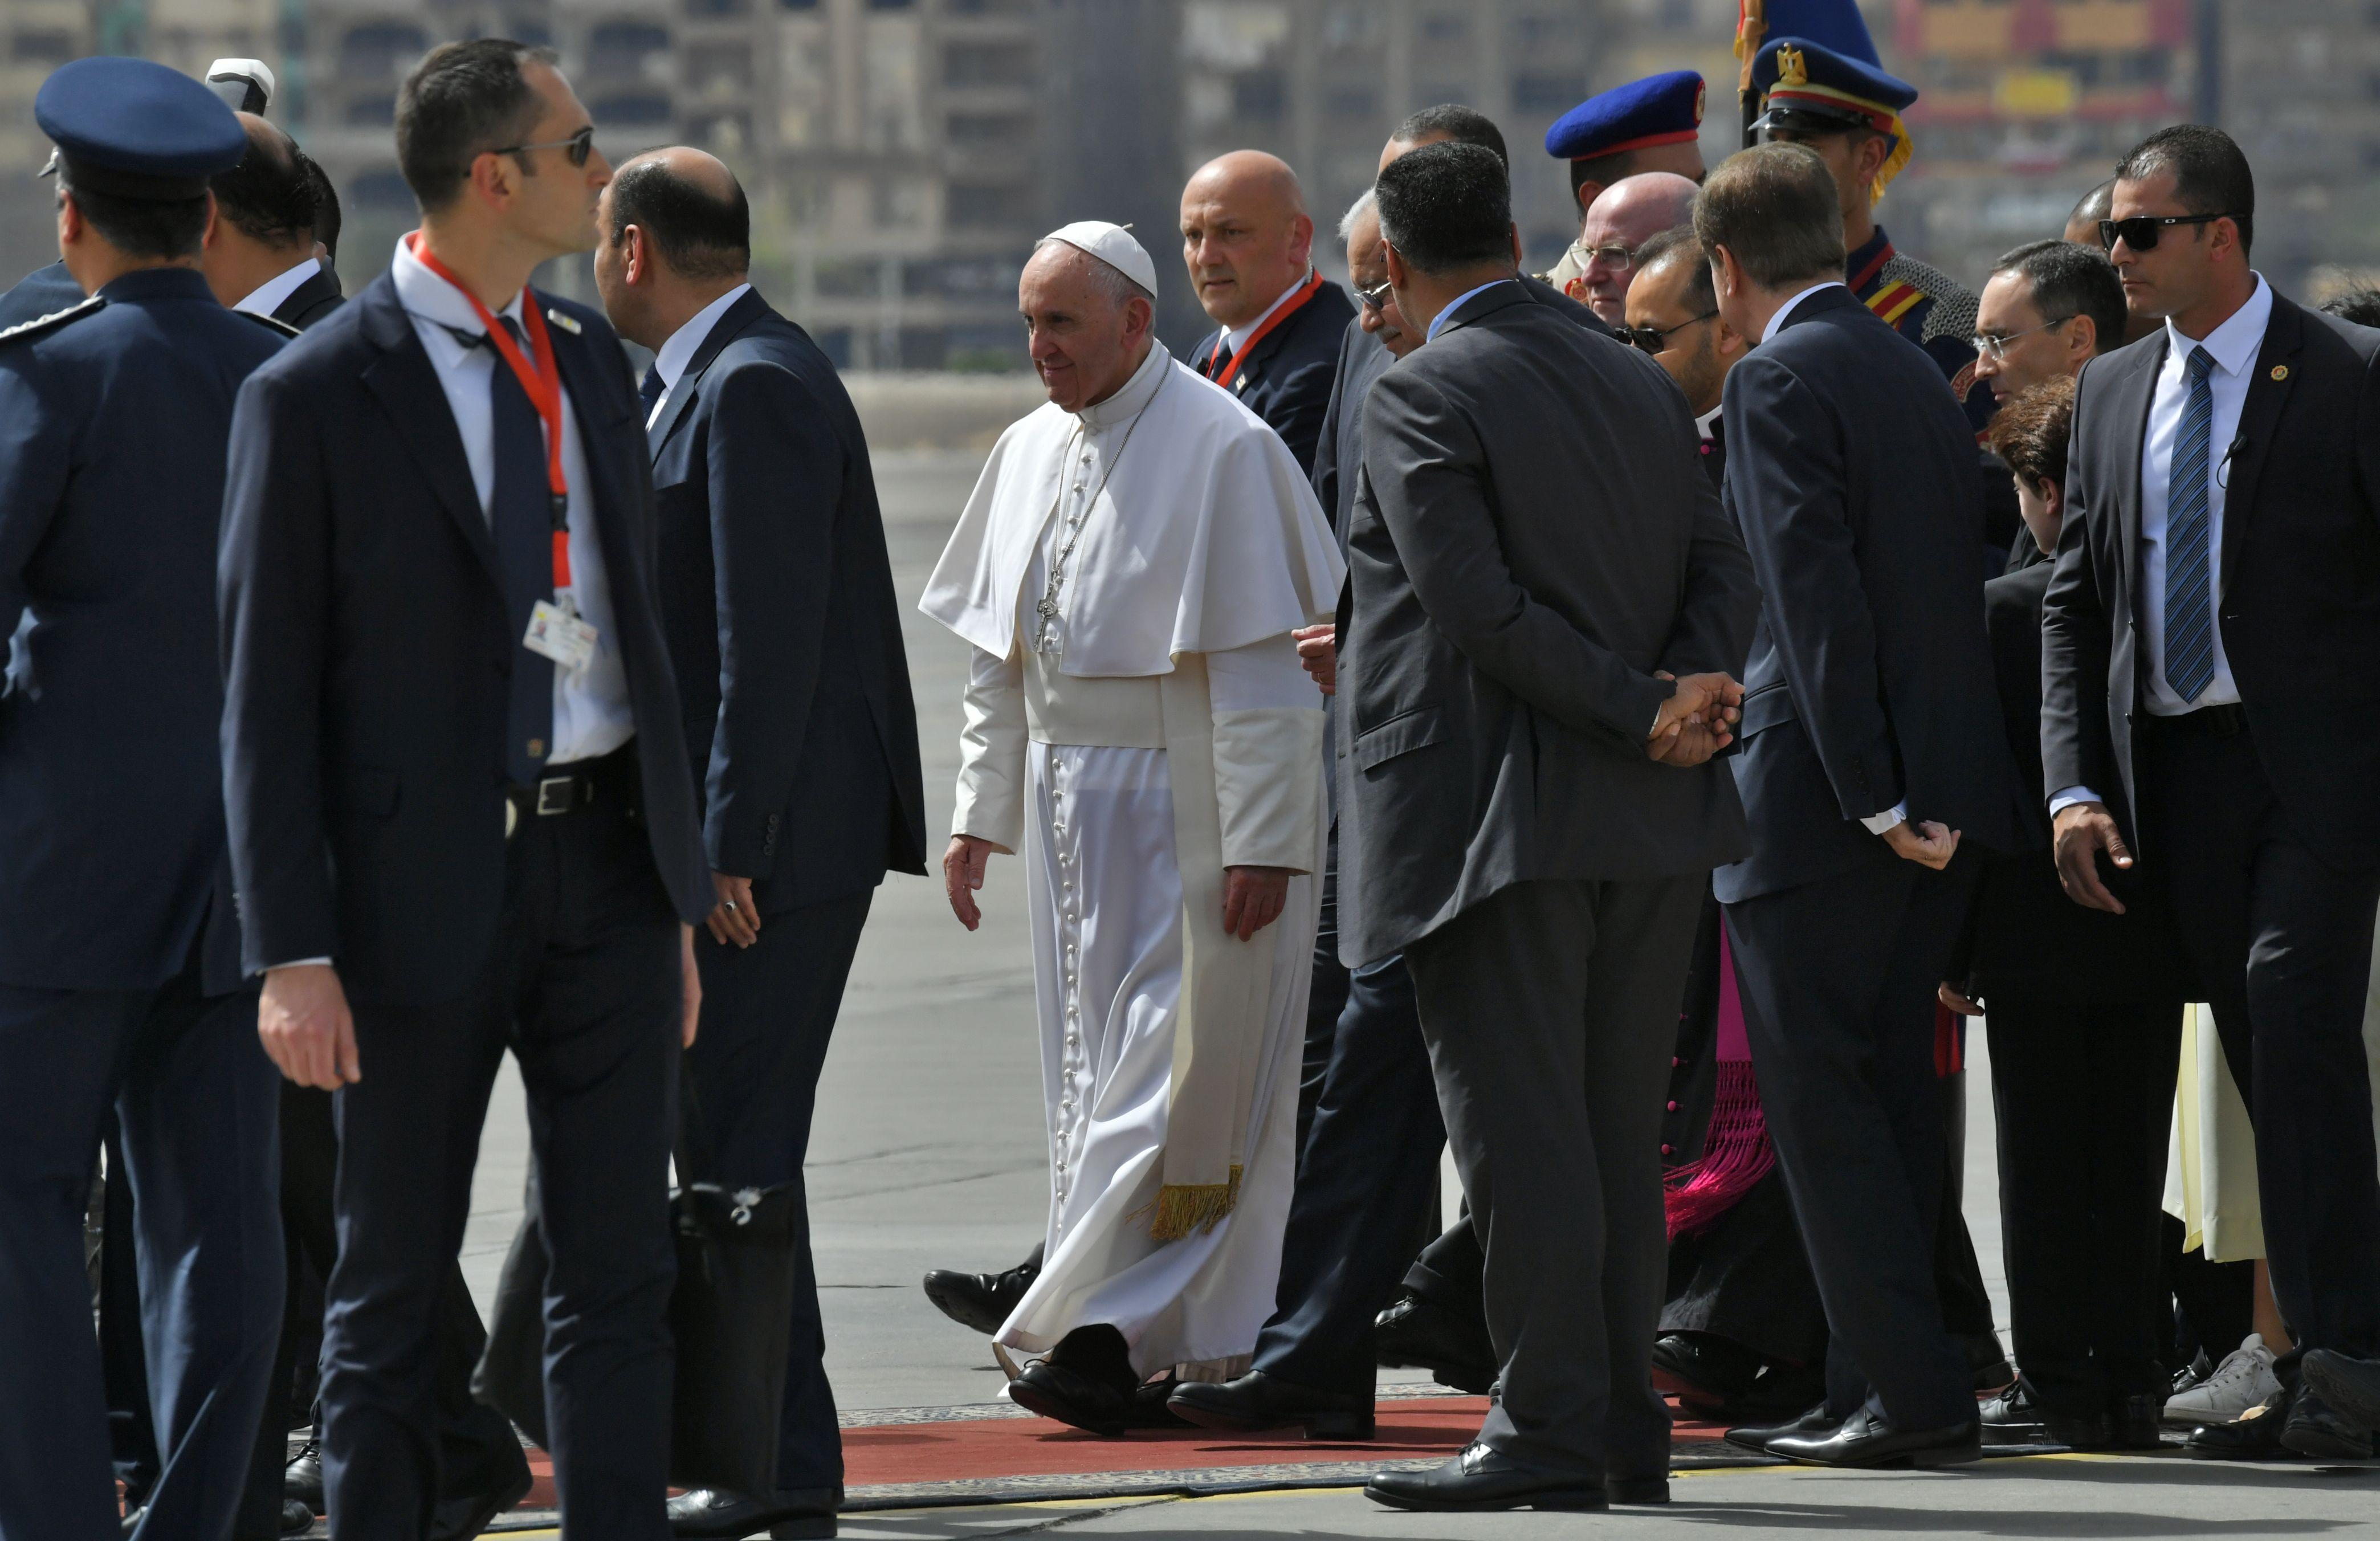 بابا الفاتيكان فور وصوله مطار القاهرة